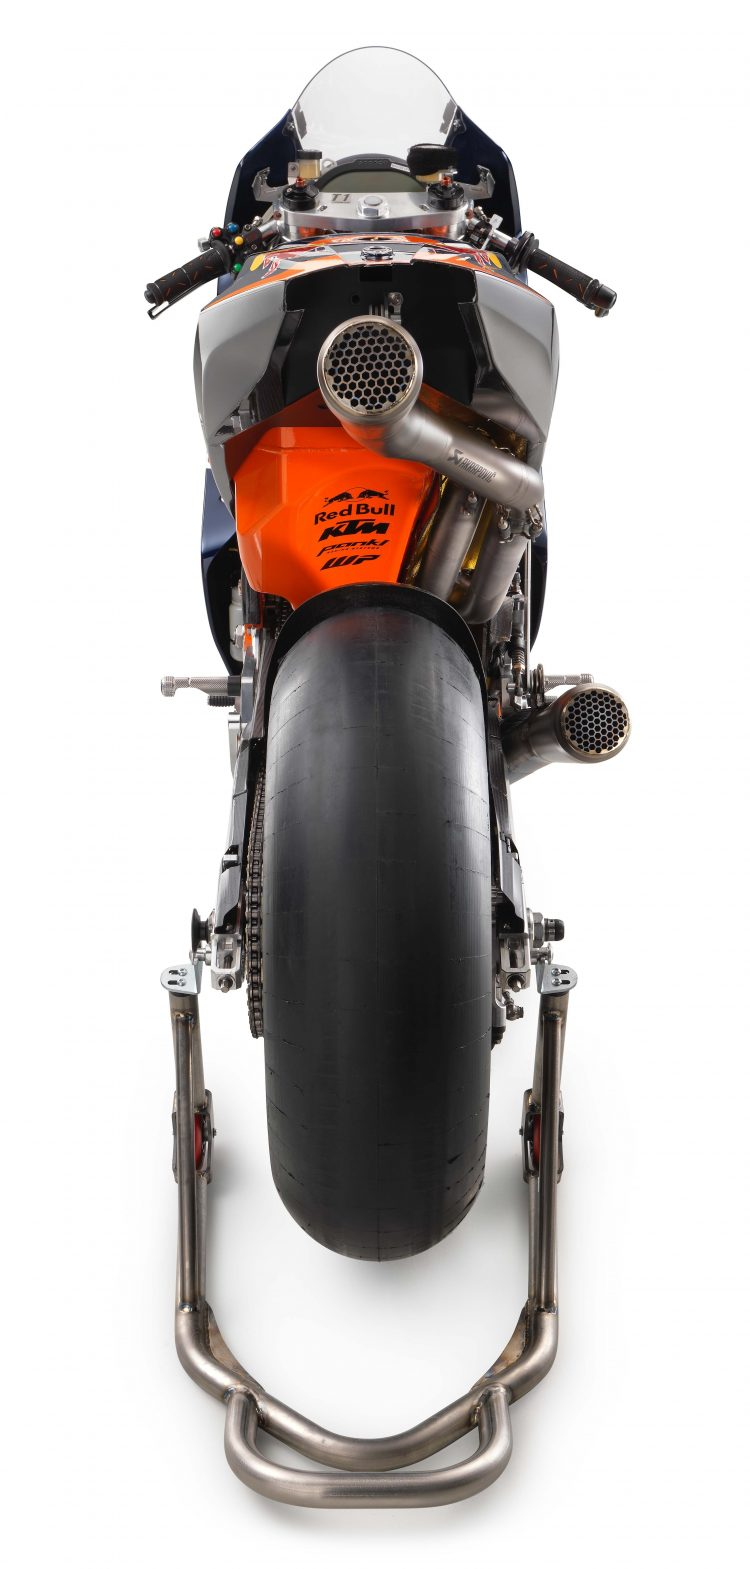 KTM RC16 Racer 6